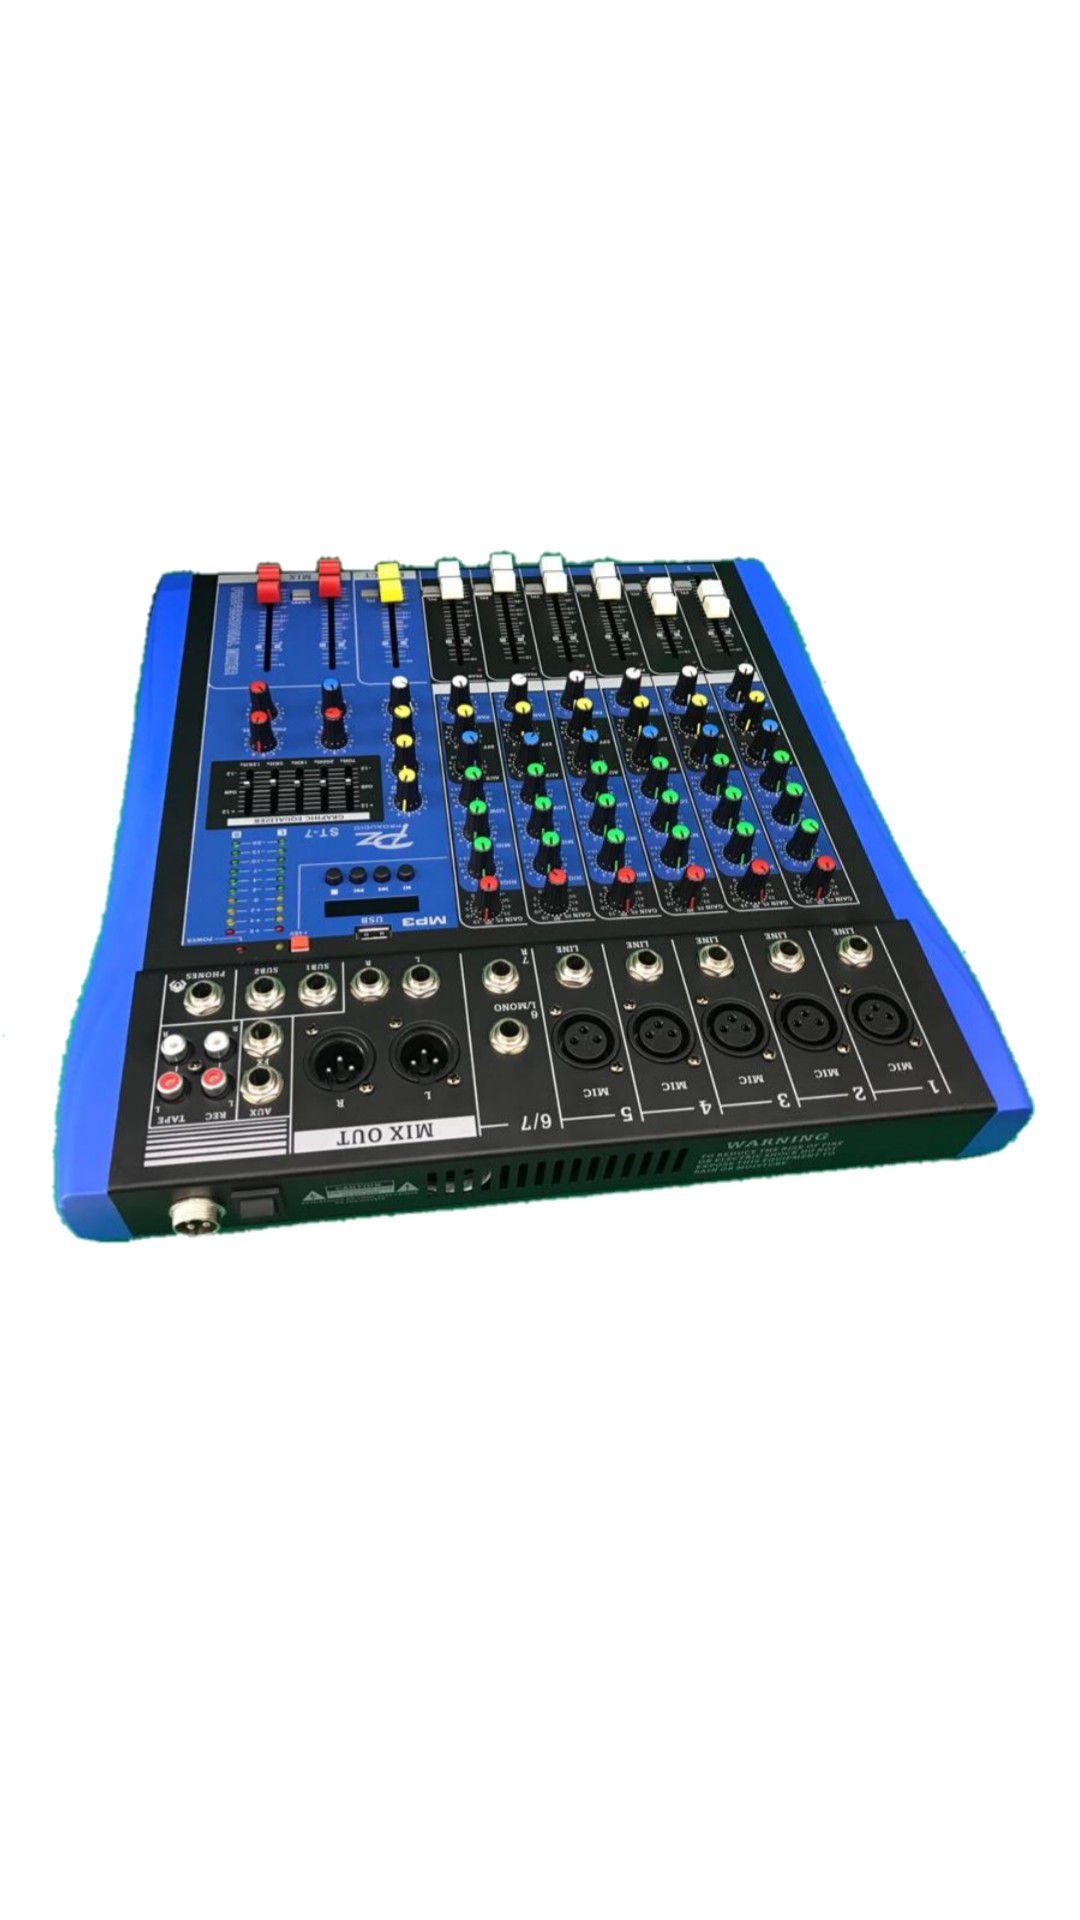 MESA.7CANAIS PZ PROAUDIO PZST7 5XLR 2P10 C/PHANTOM USB BLUETOOTH 1AUX